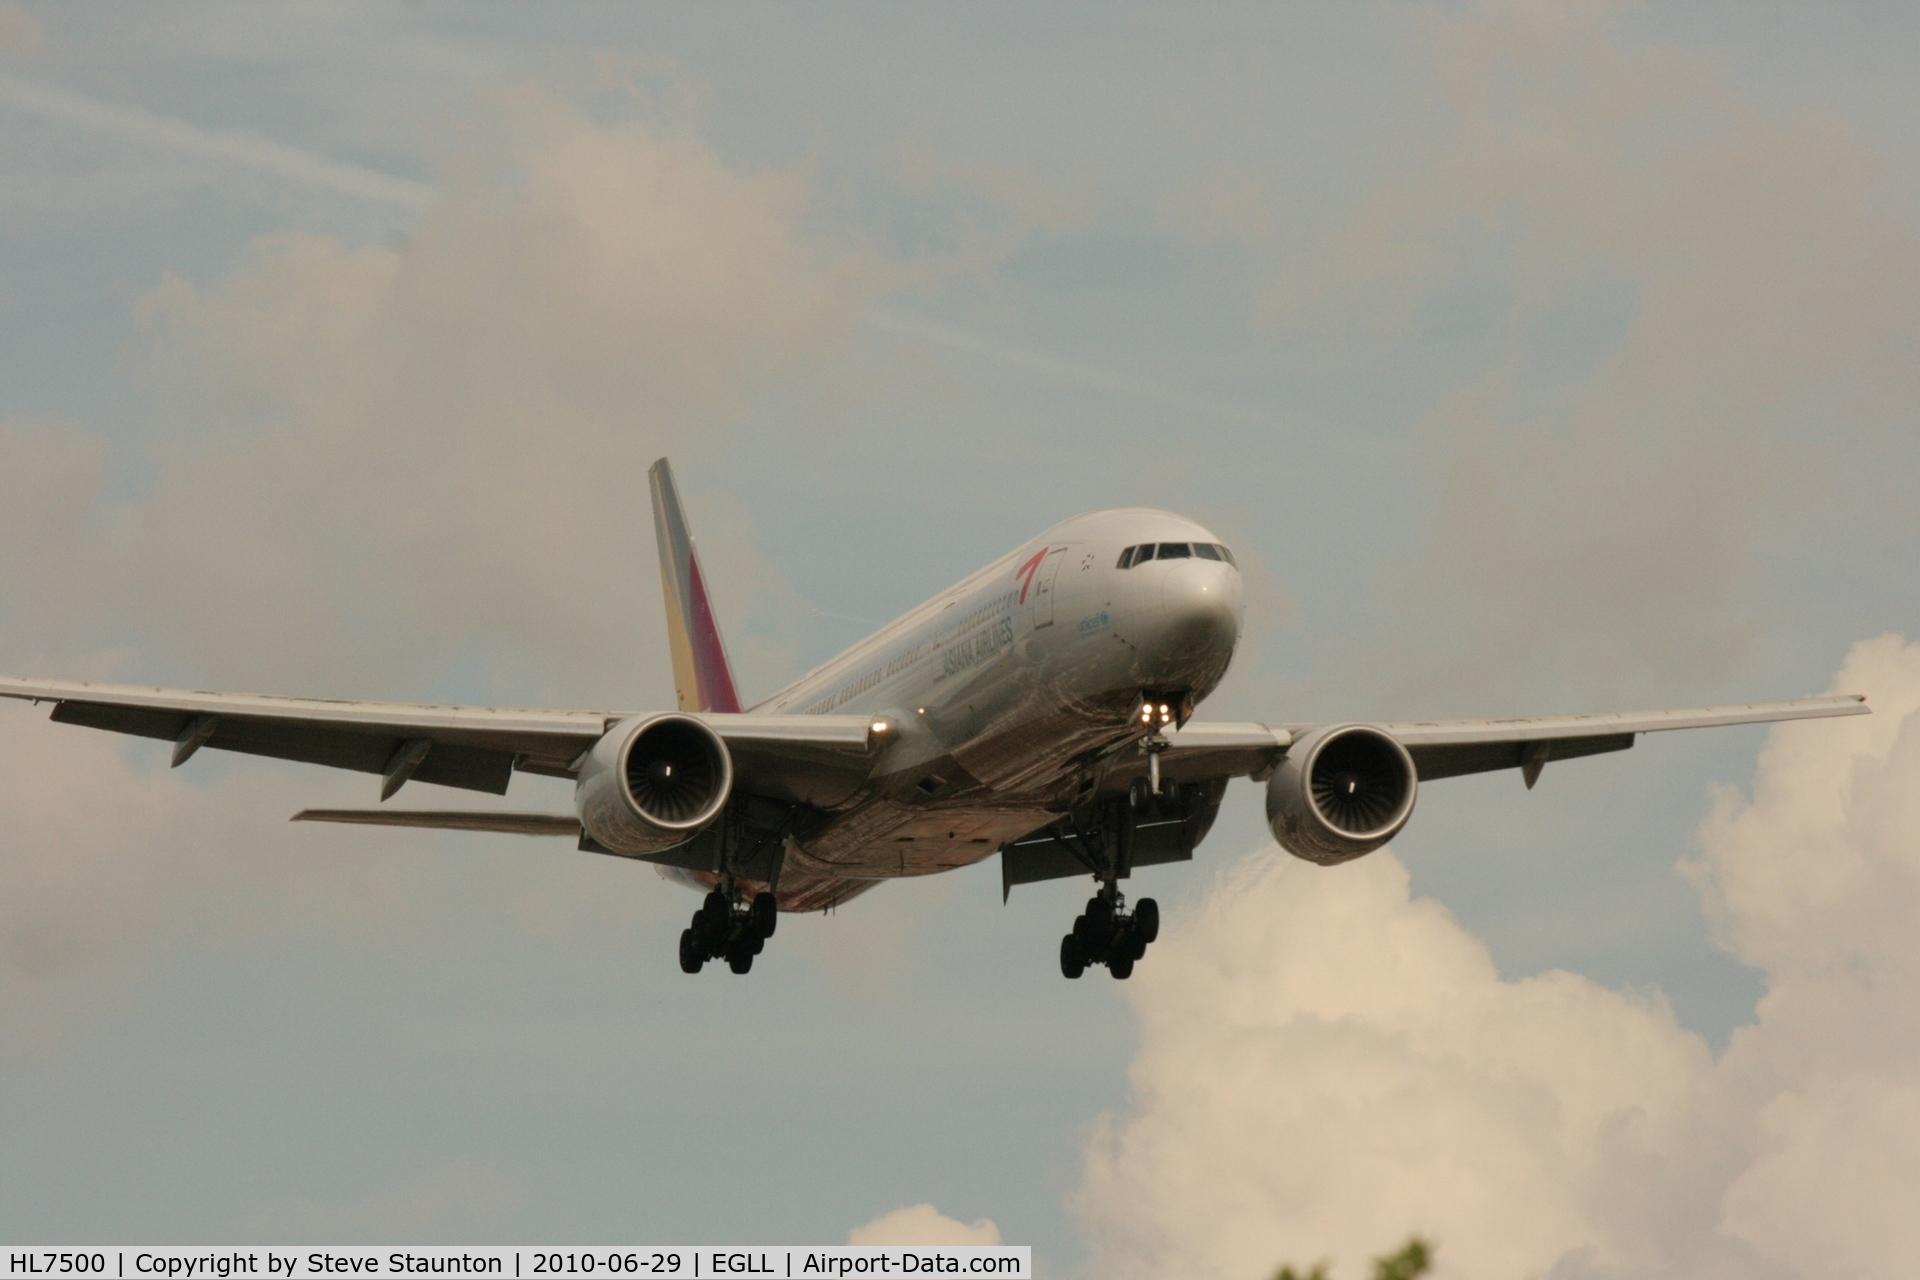 HL7500, 2002 Boeing 777-28E/ER C/N 28685, Taken at Heathrow Airport, June 2010